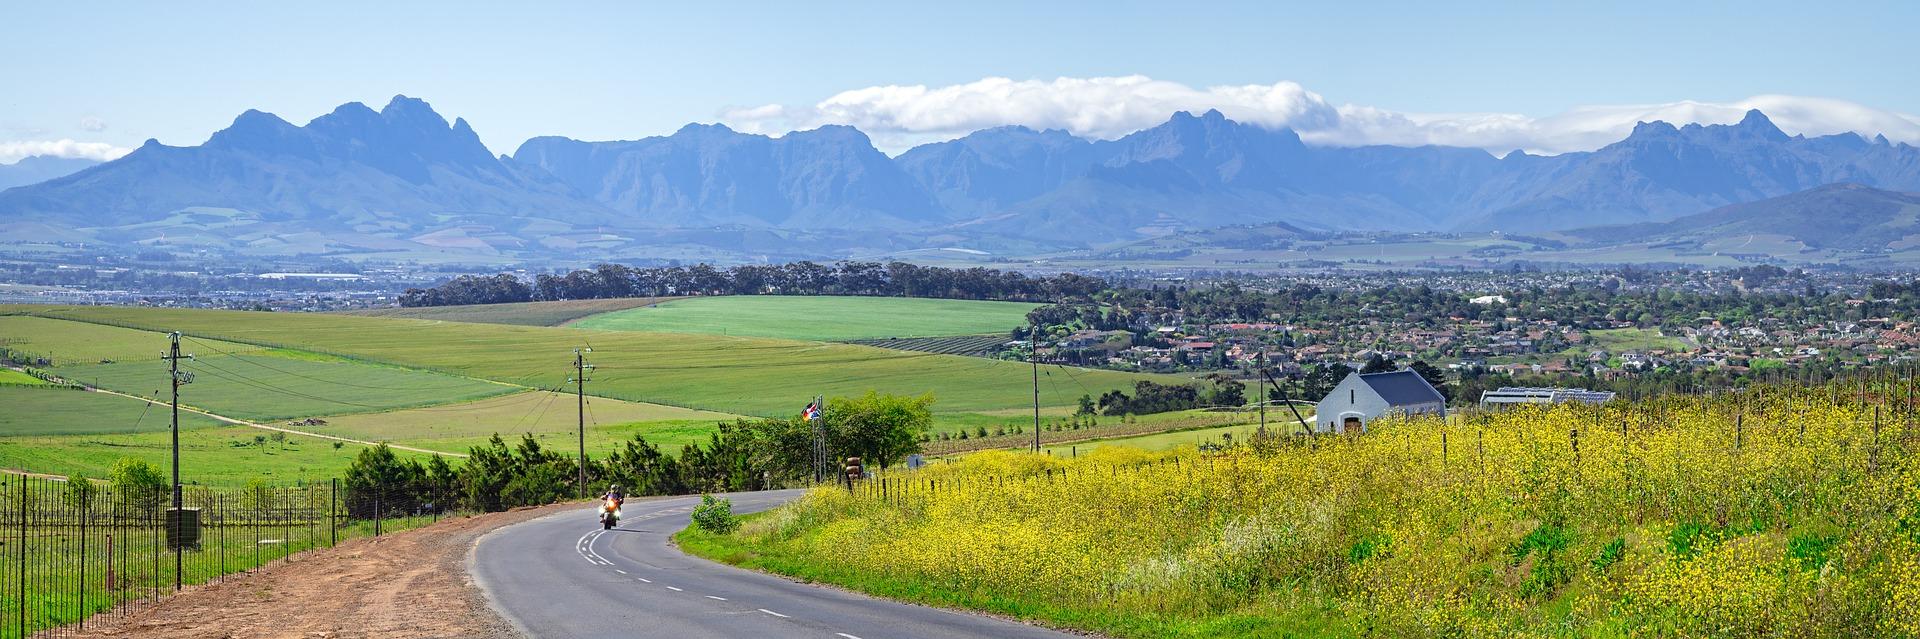 Landscape vista